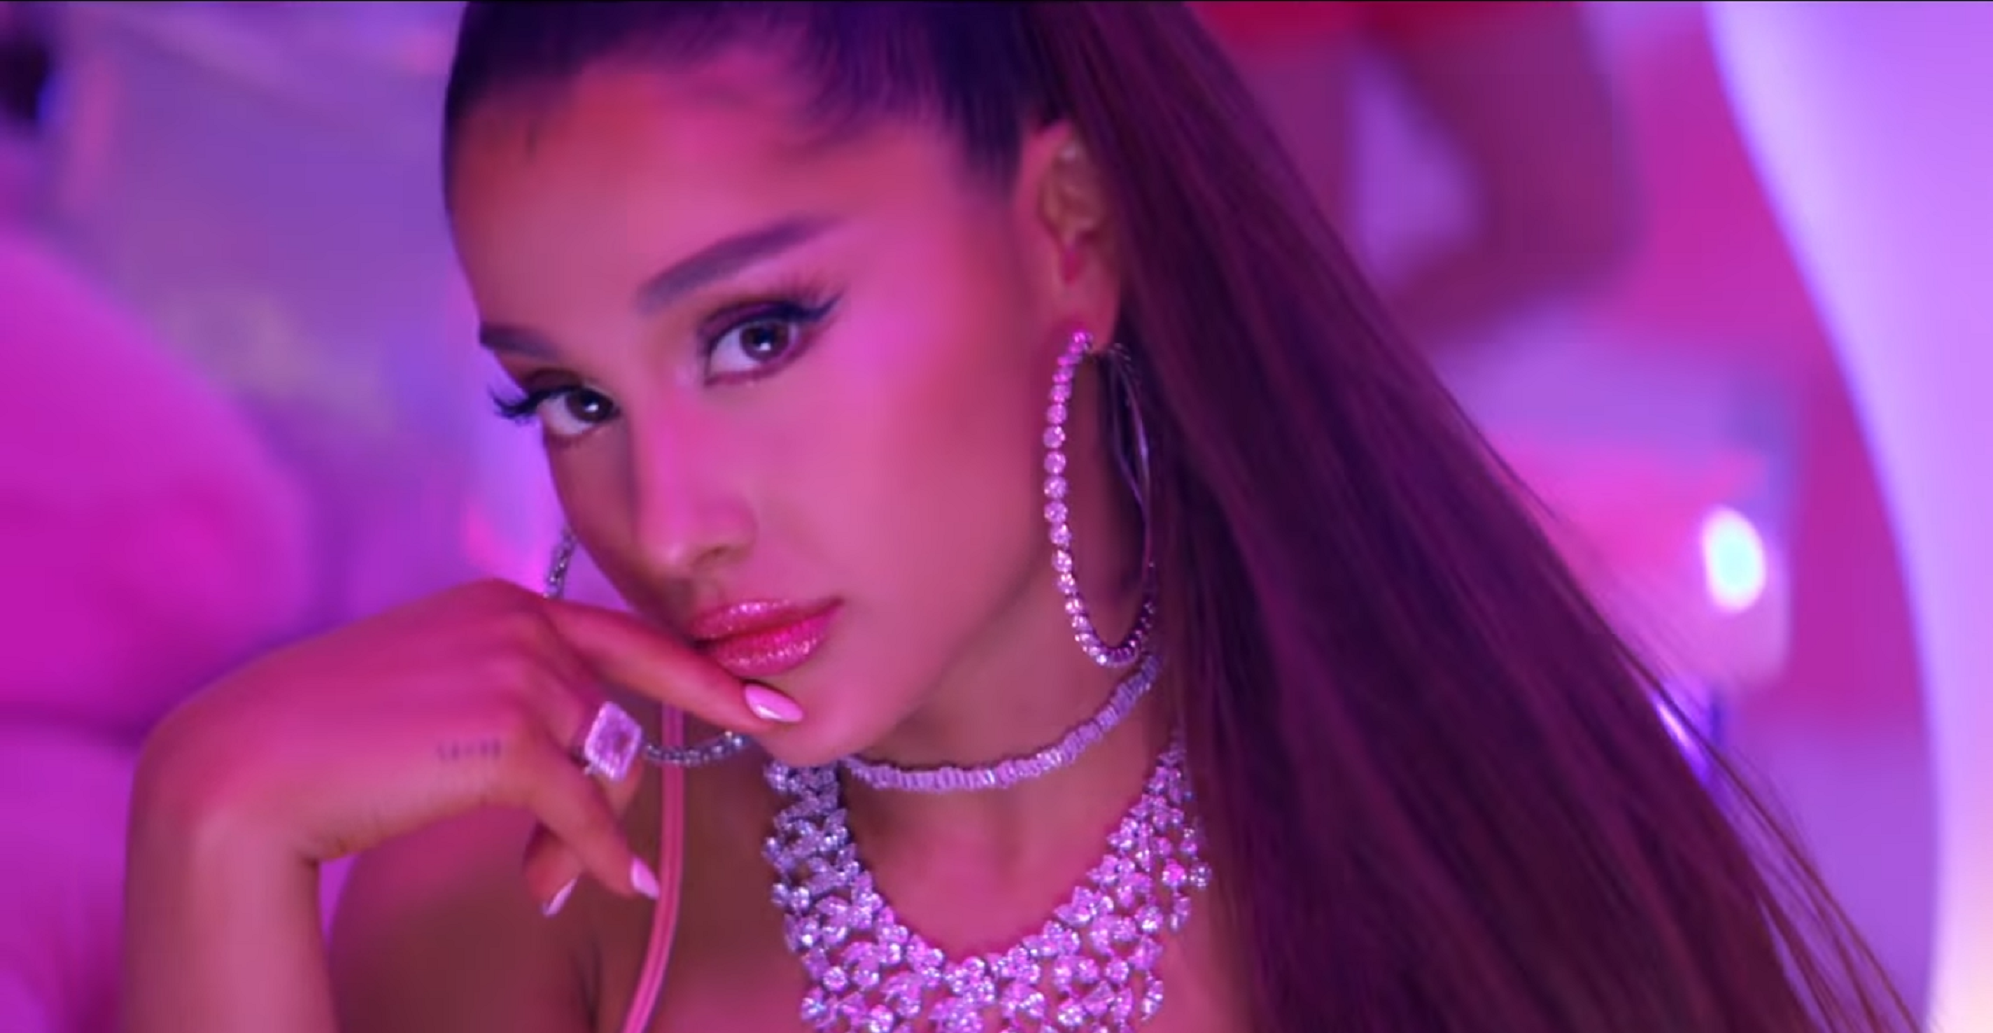 Ariana Grande's '7 Rings' Enjoys 8th Week at #1 on Billboard Hot 100